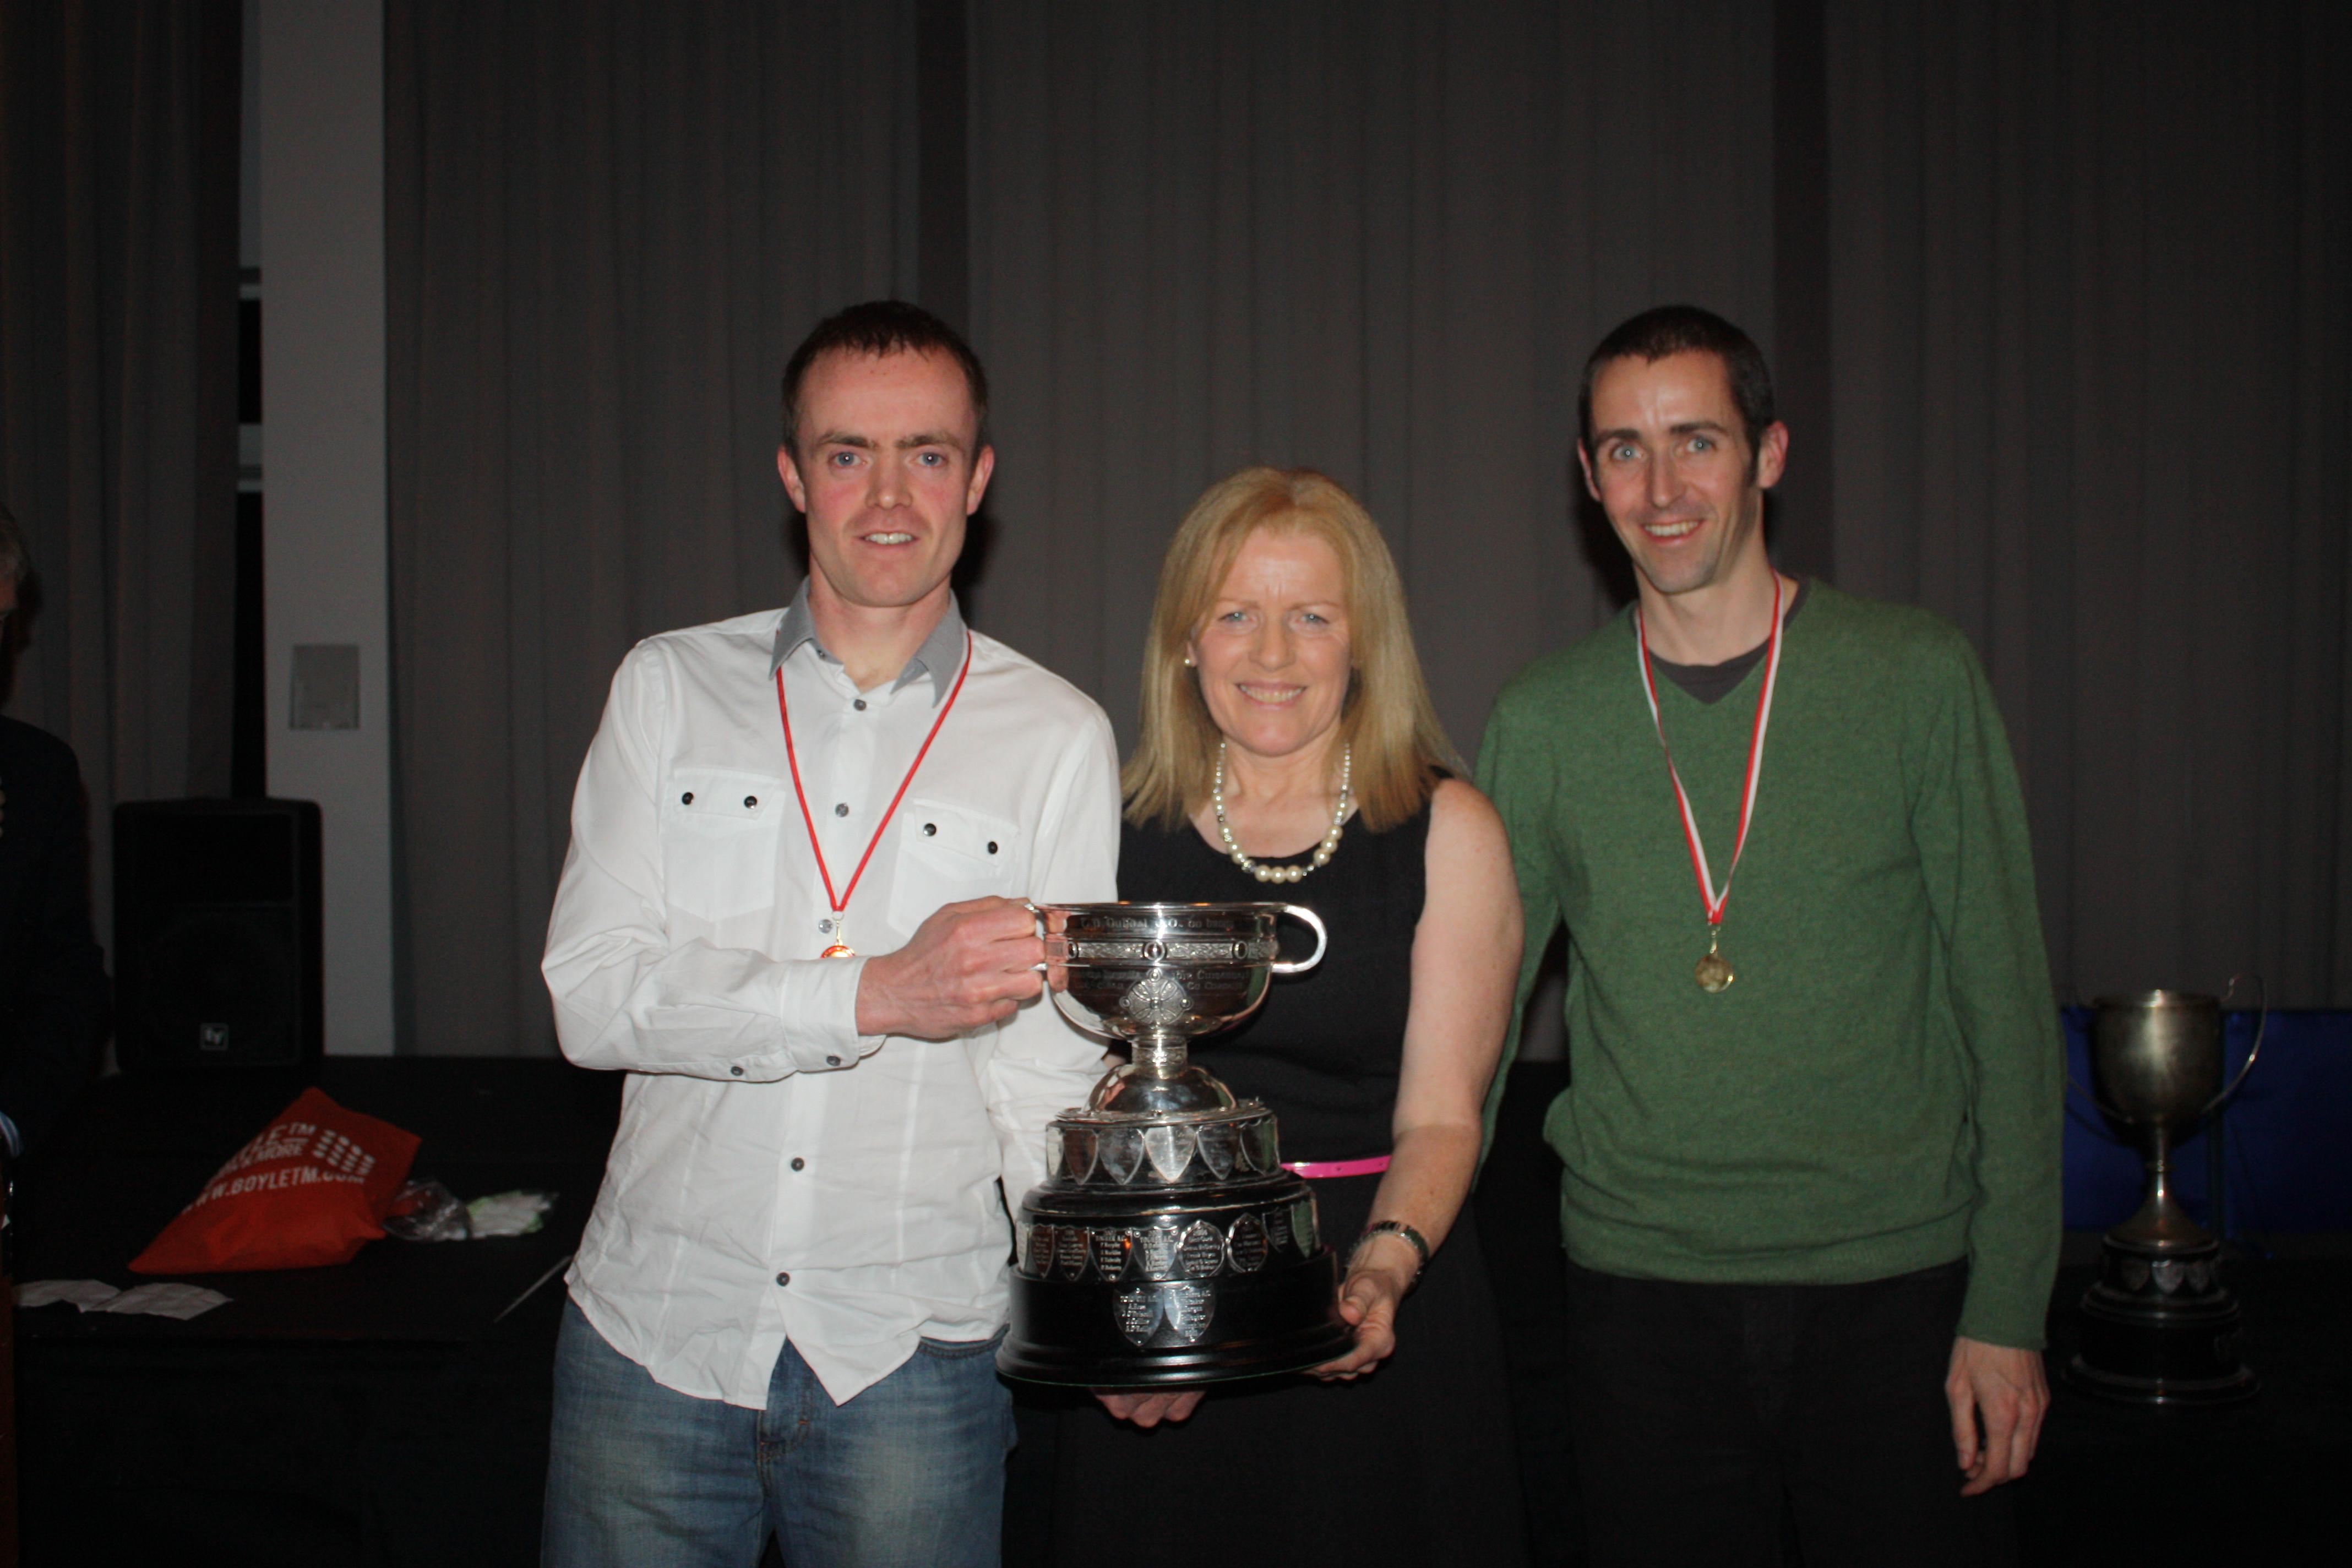 st-finbarrs-awards-night-2012-016